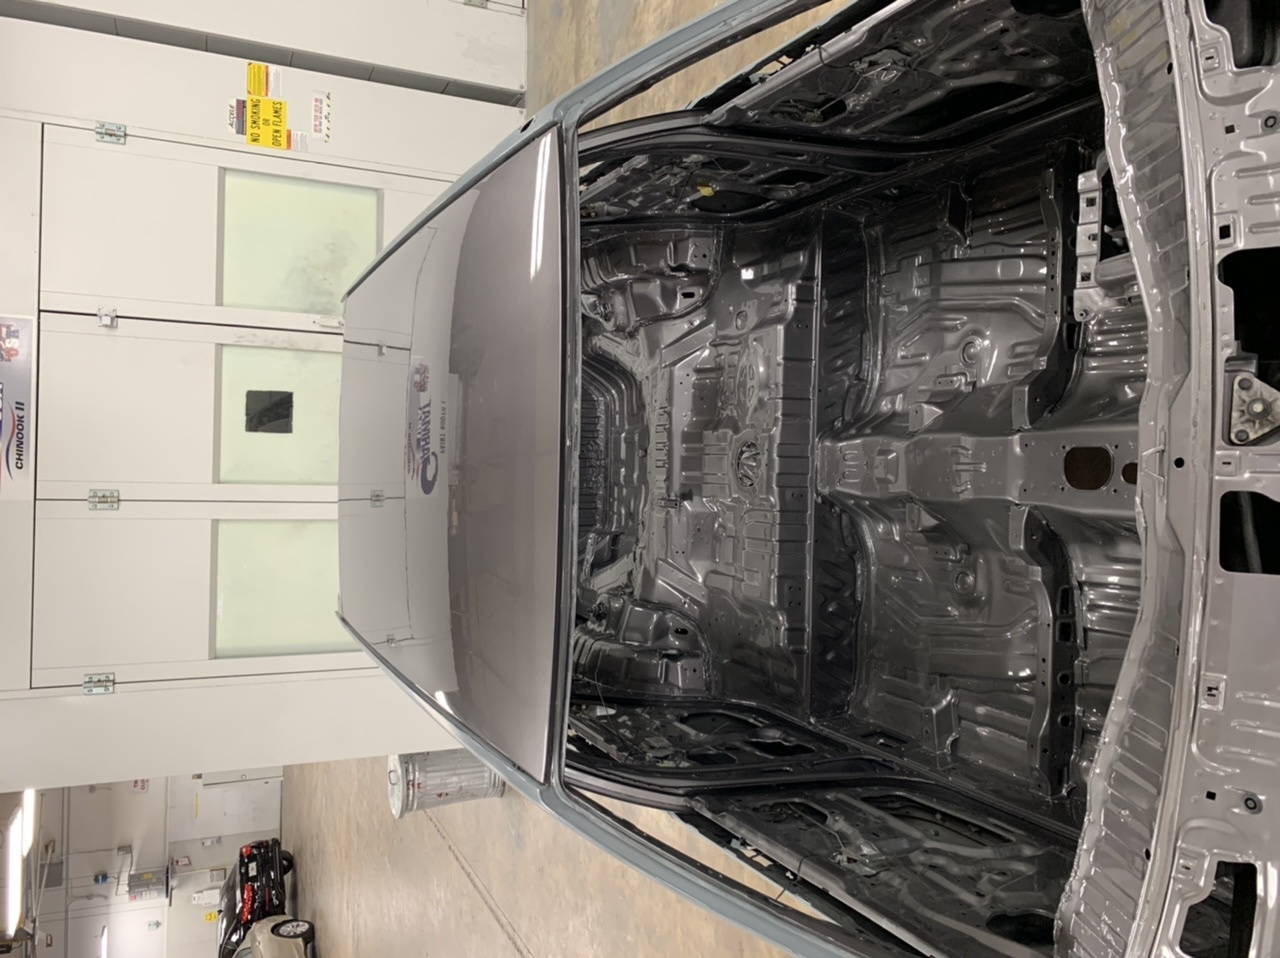 825BDD4C-AF4E-4100-999F-044B997EF295.jpeg